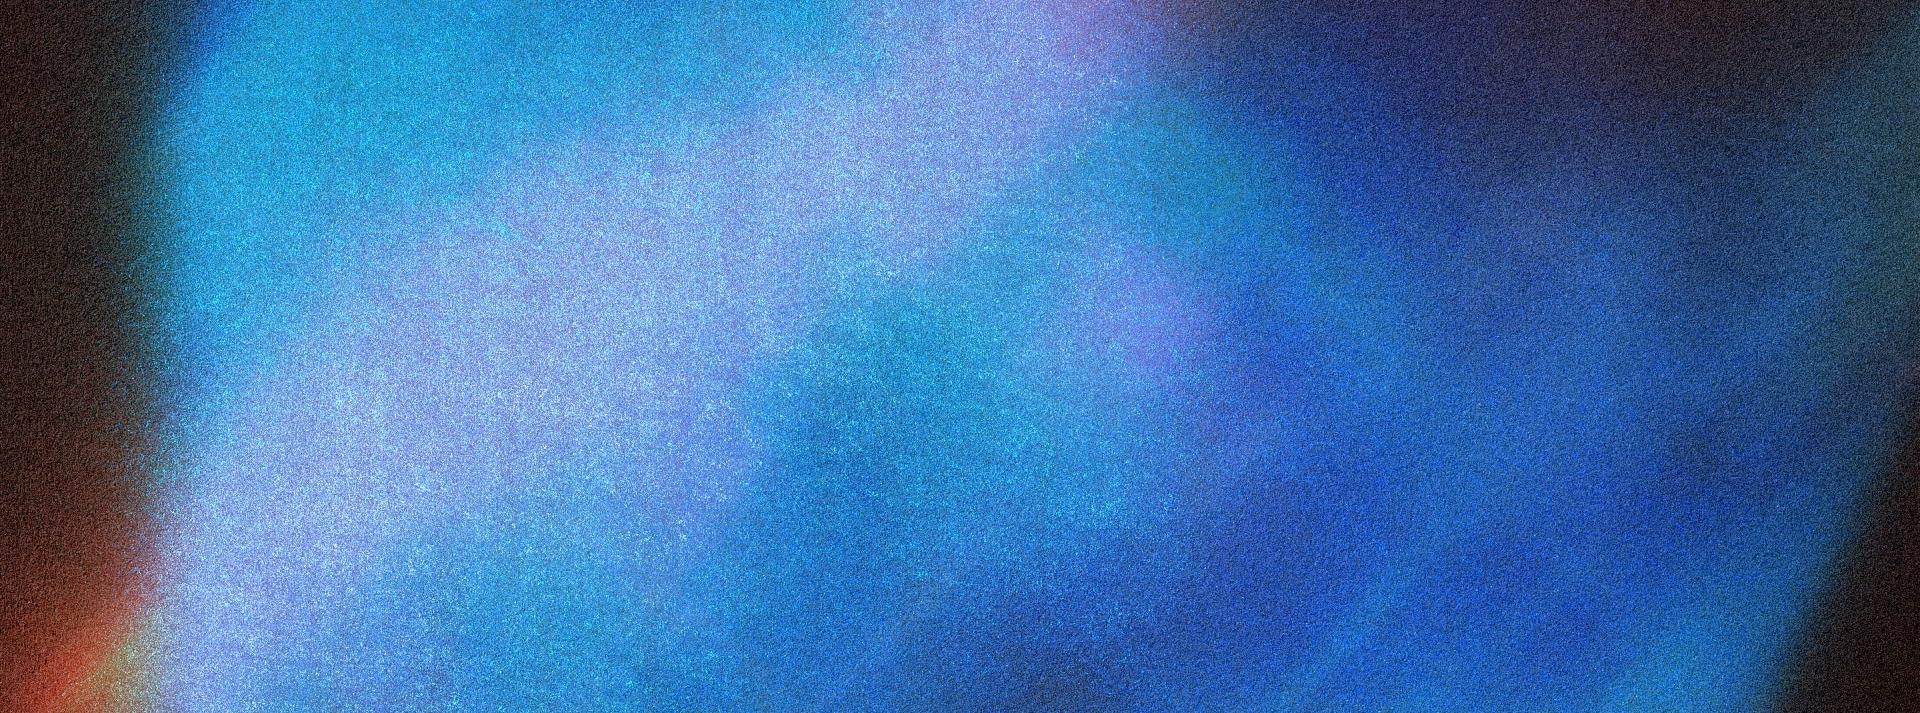 space_glass_blue-worship-1-still-16x9.jpg